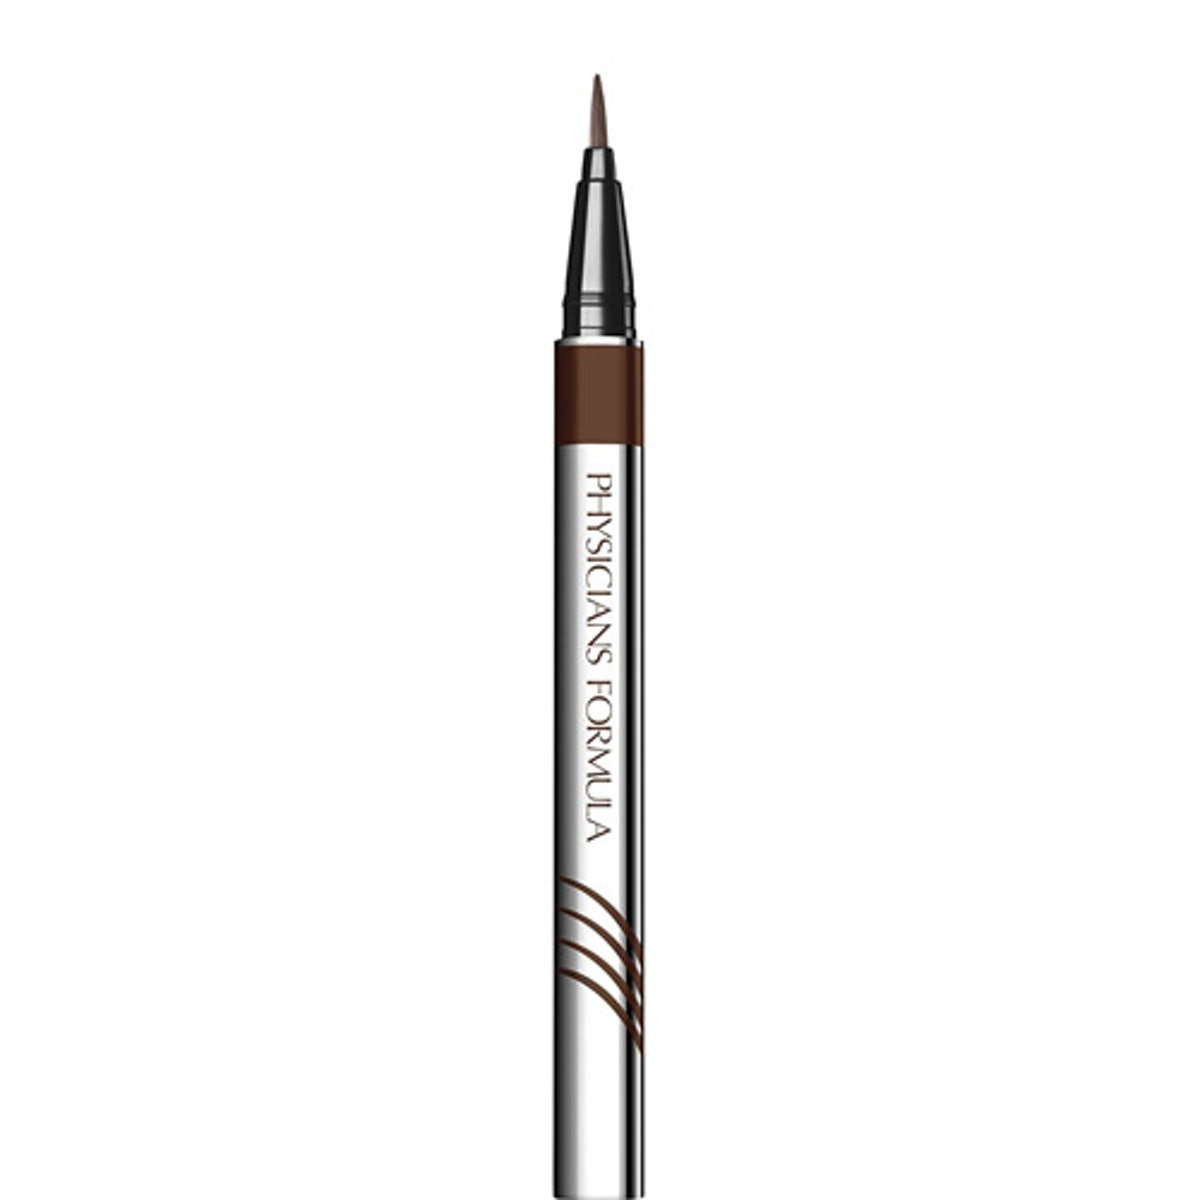 Physicians Formula 2-in-1 Lash Boosting Eyeliner & Serum, Deep Brown